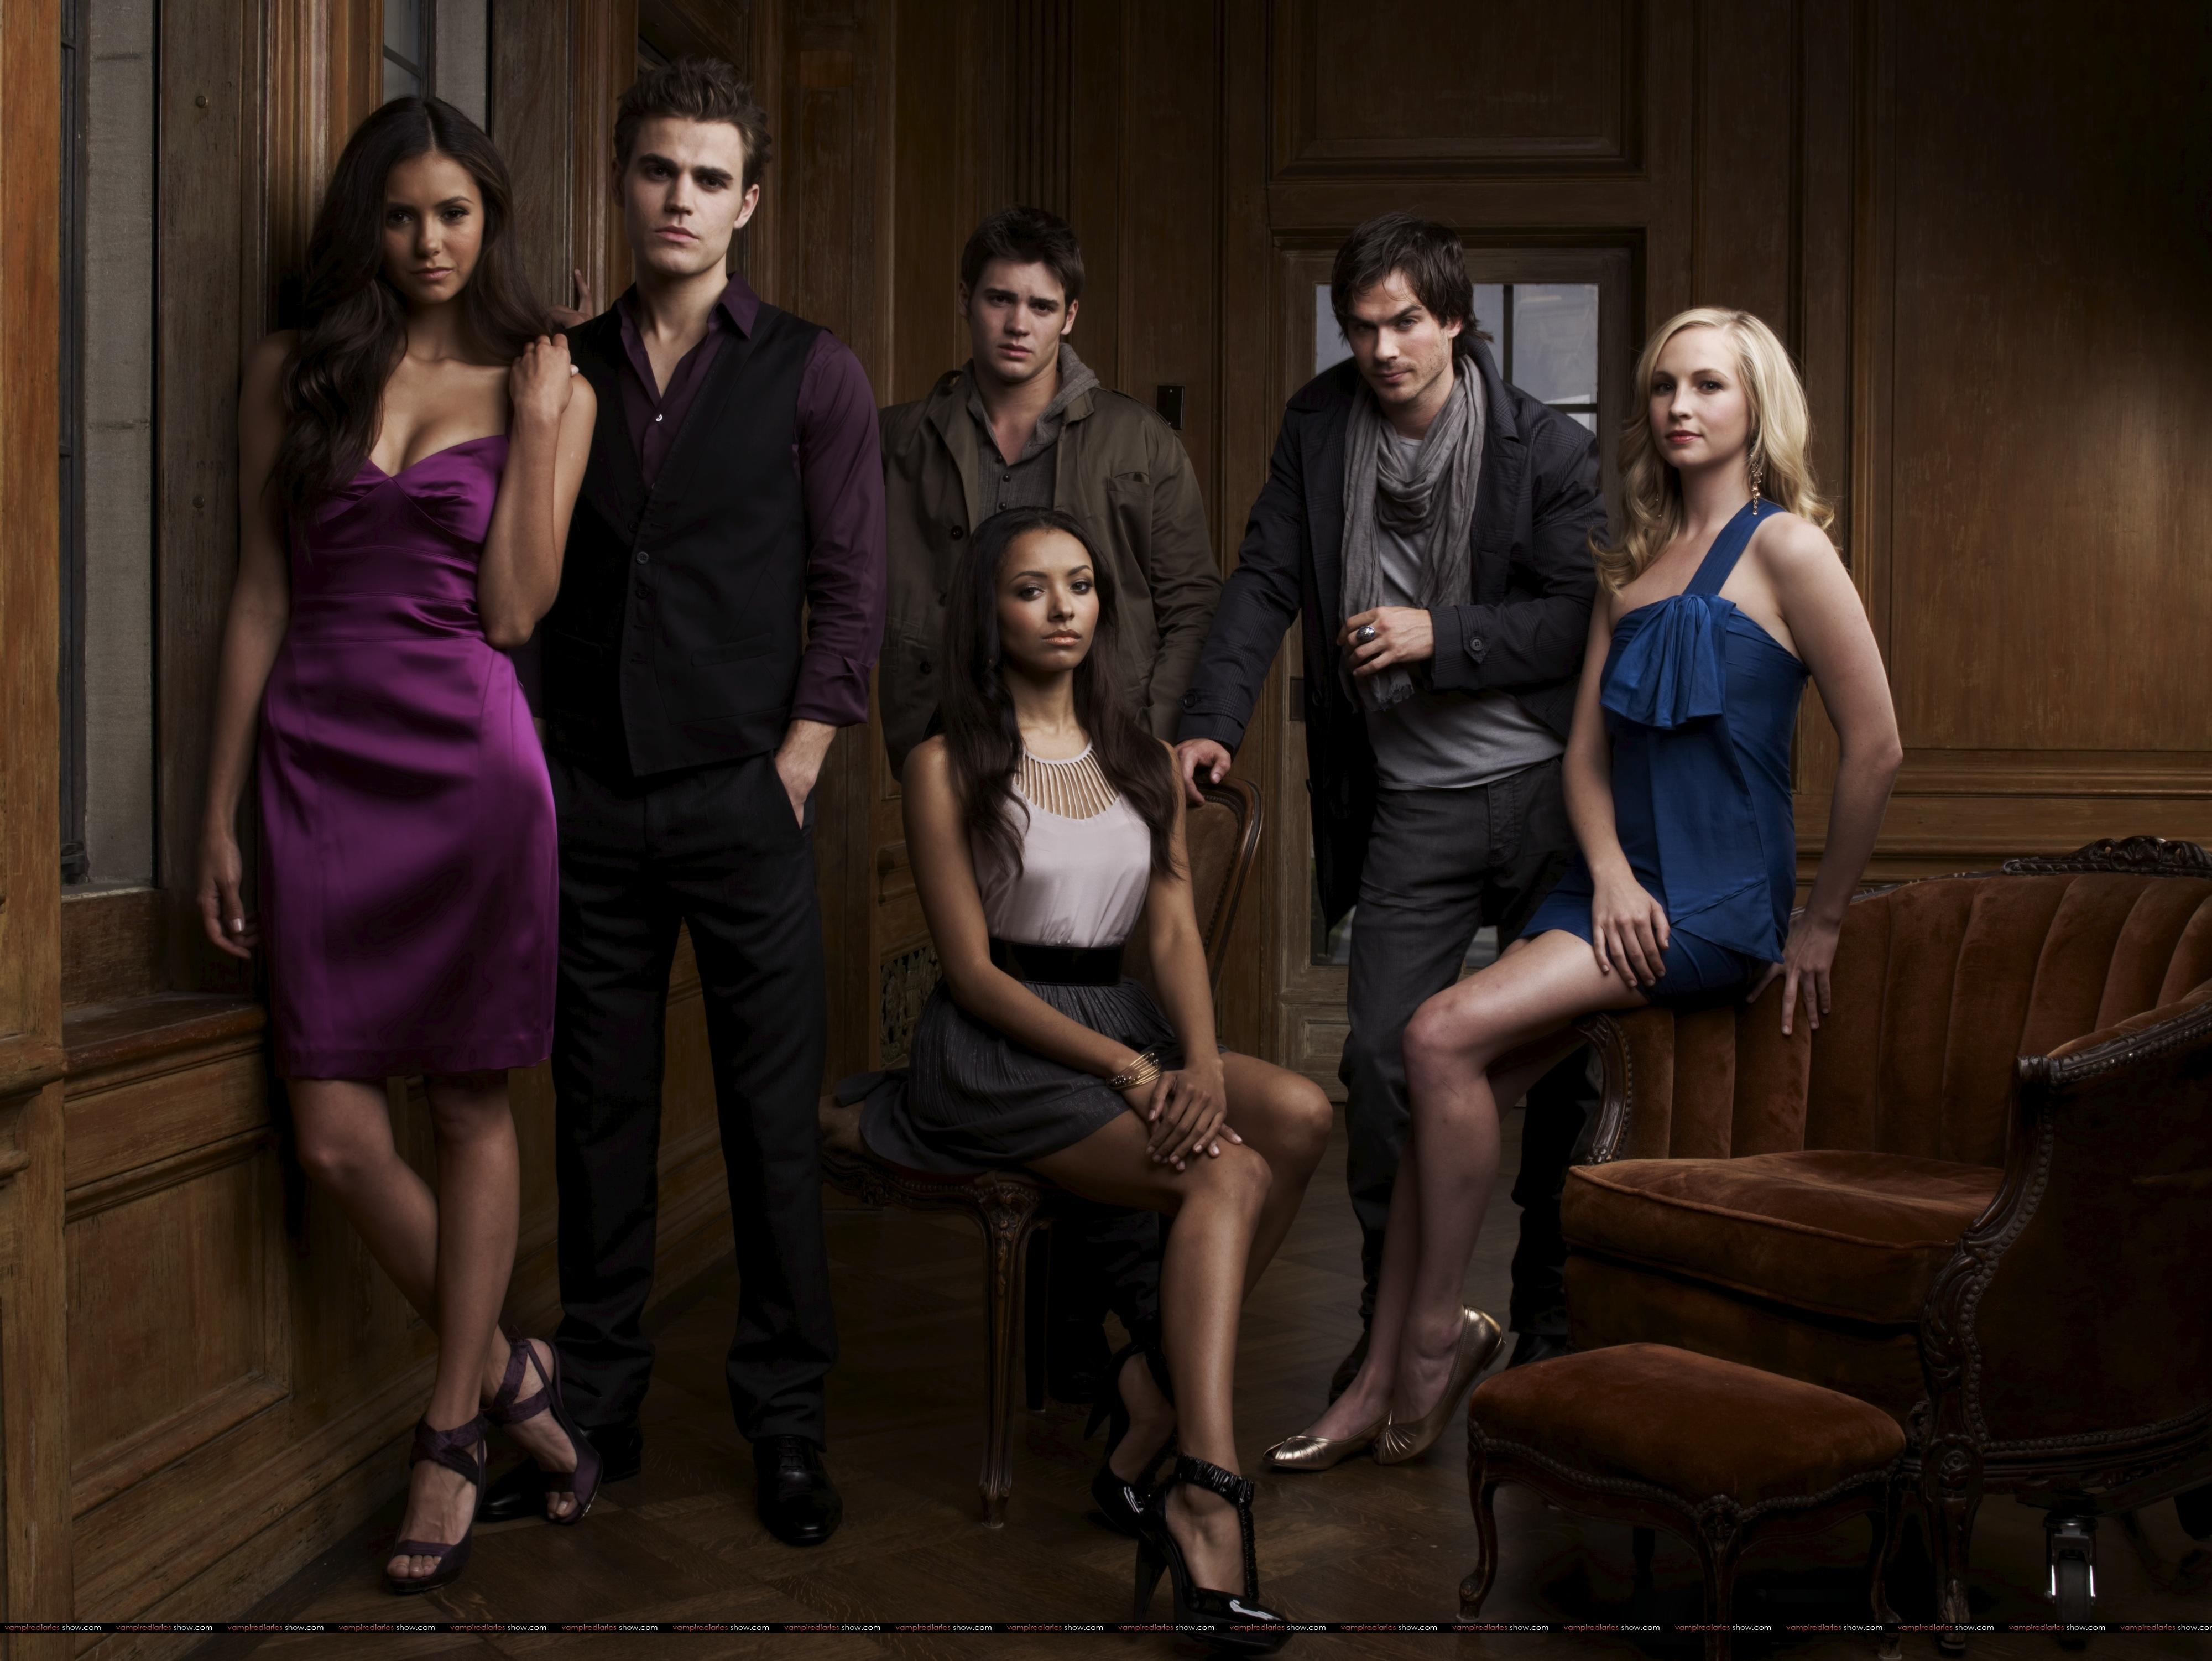 Vampire Diaries SAISON 2 dans vampire diaries vampire-diaries-saison-1-fond-ecran